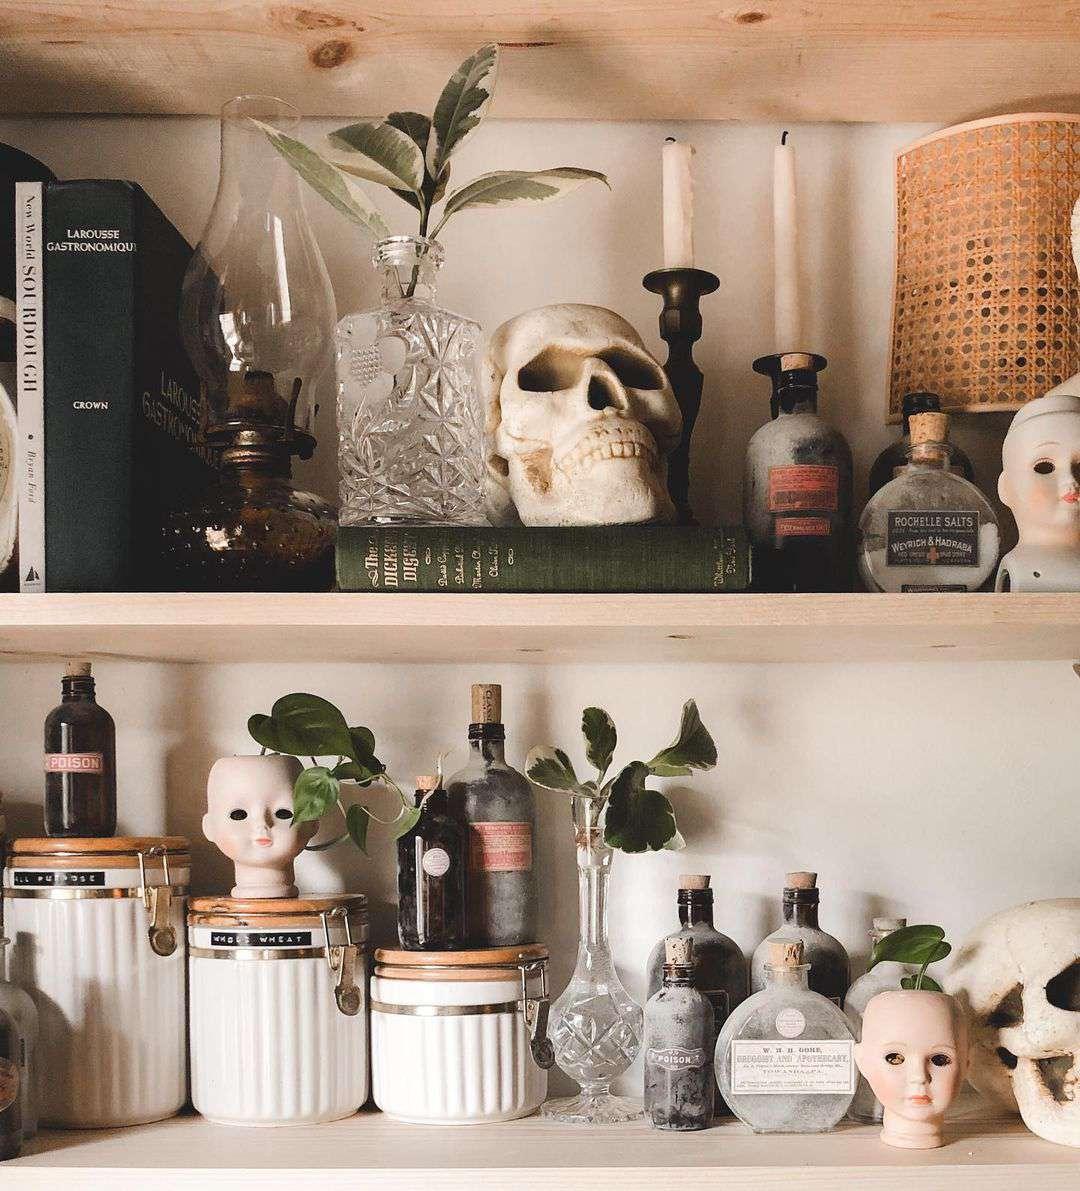 Bookshelf with baby doll heads